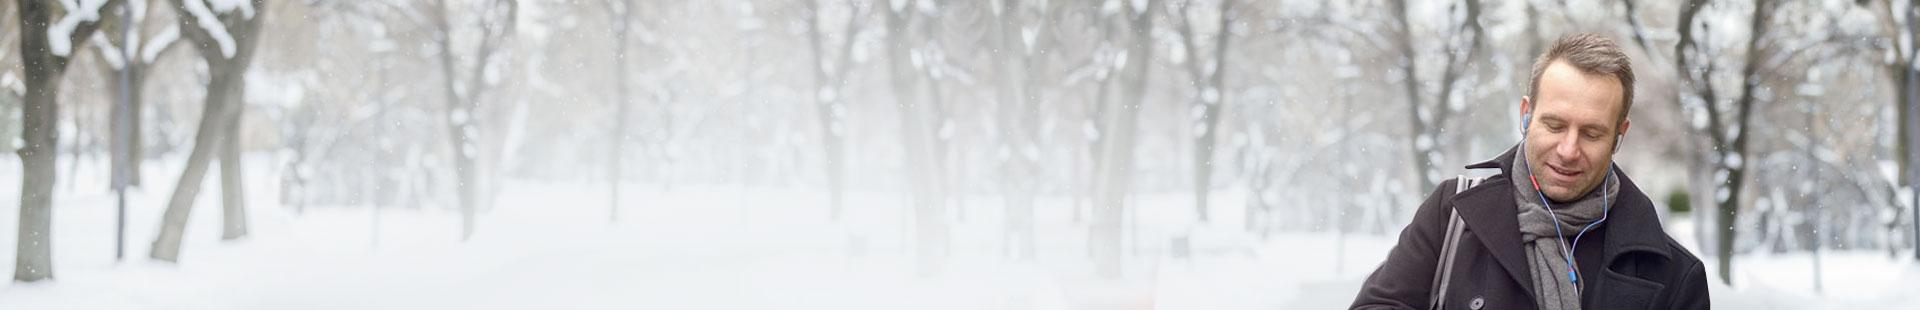 winter-podcast-4-1920x310